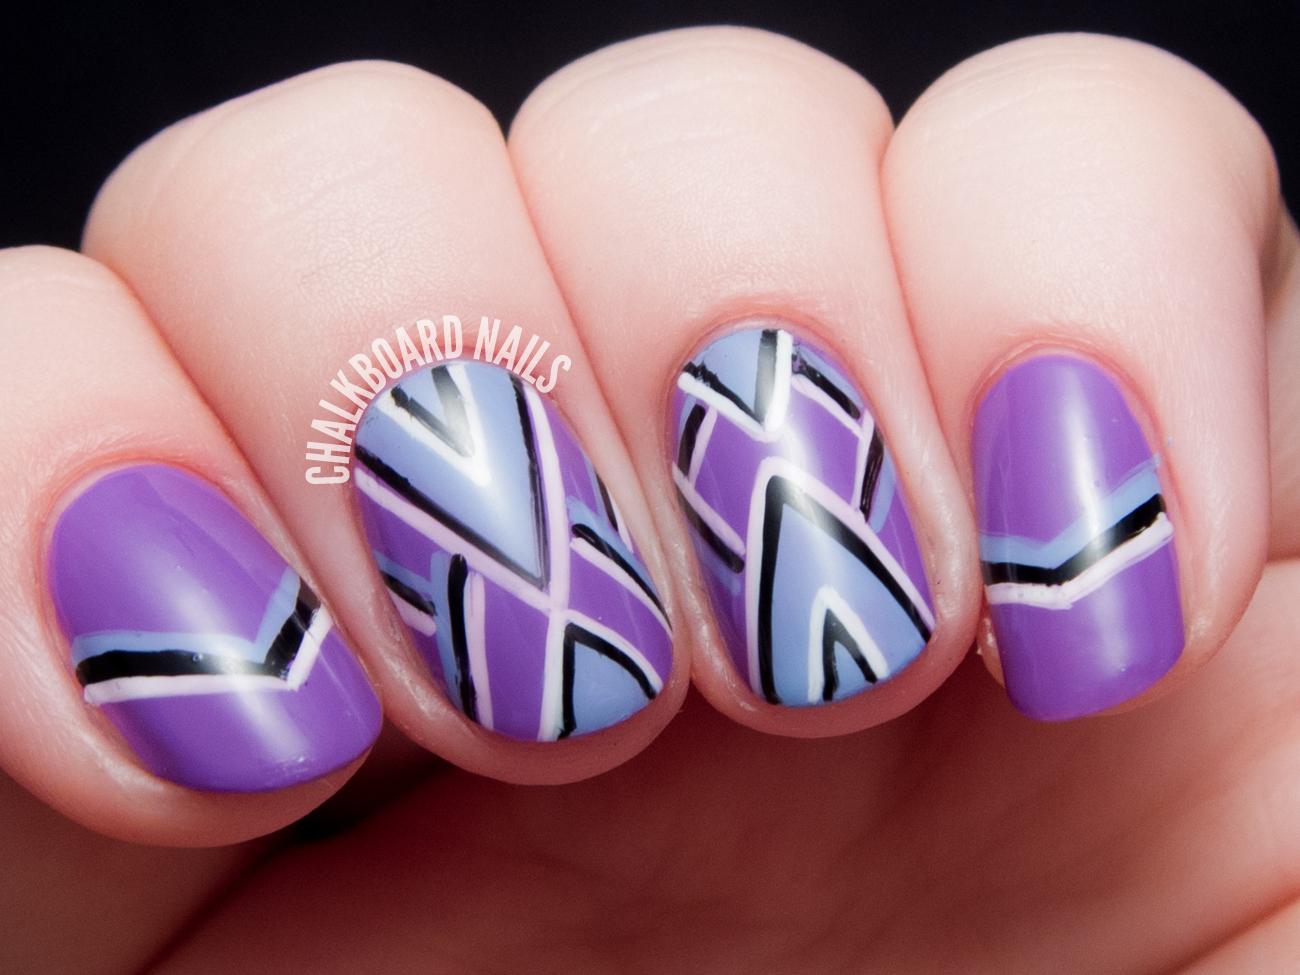 Luxury Freehand Nail Art Design Ensign - Nail Art Ideas - morihati.com